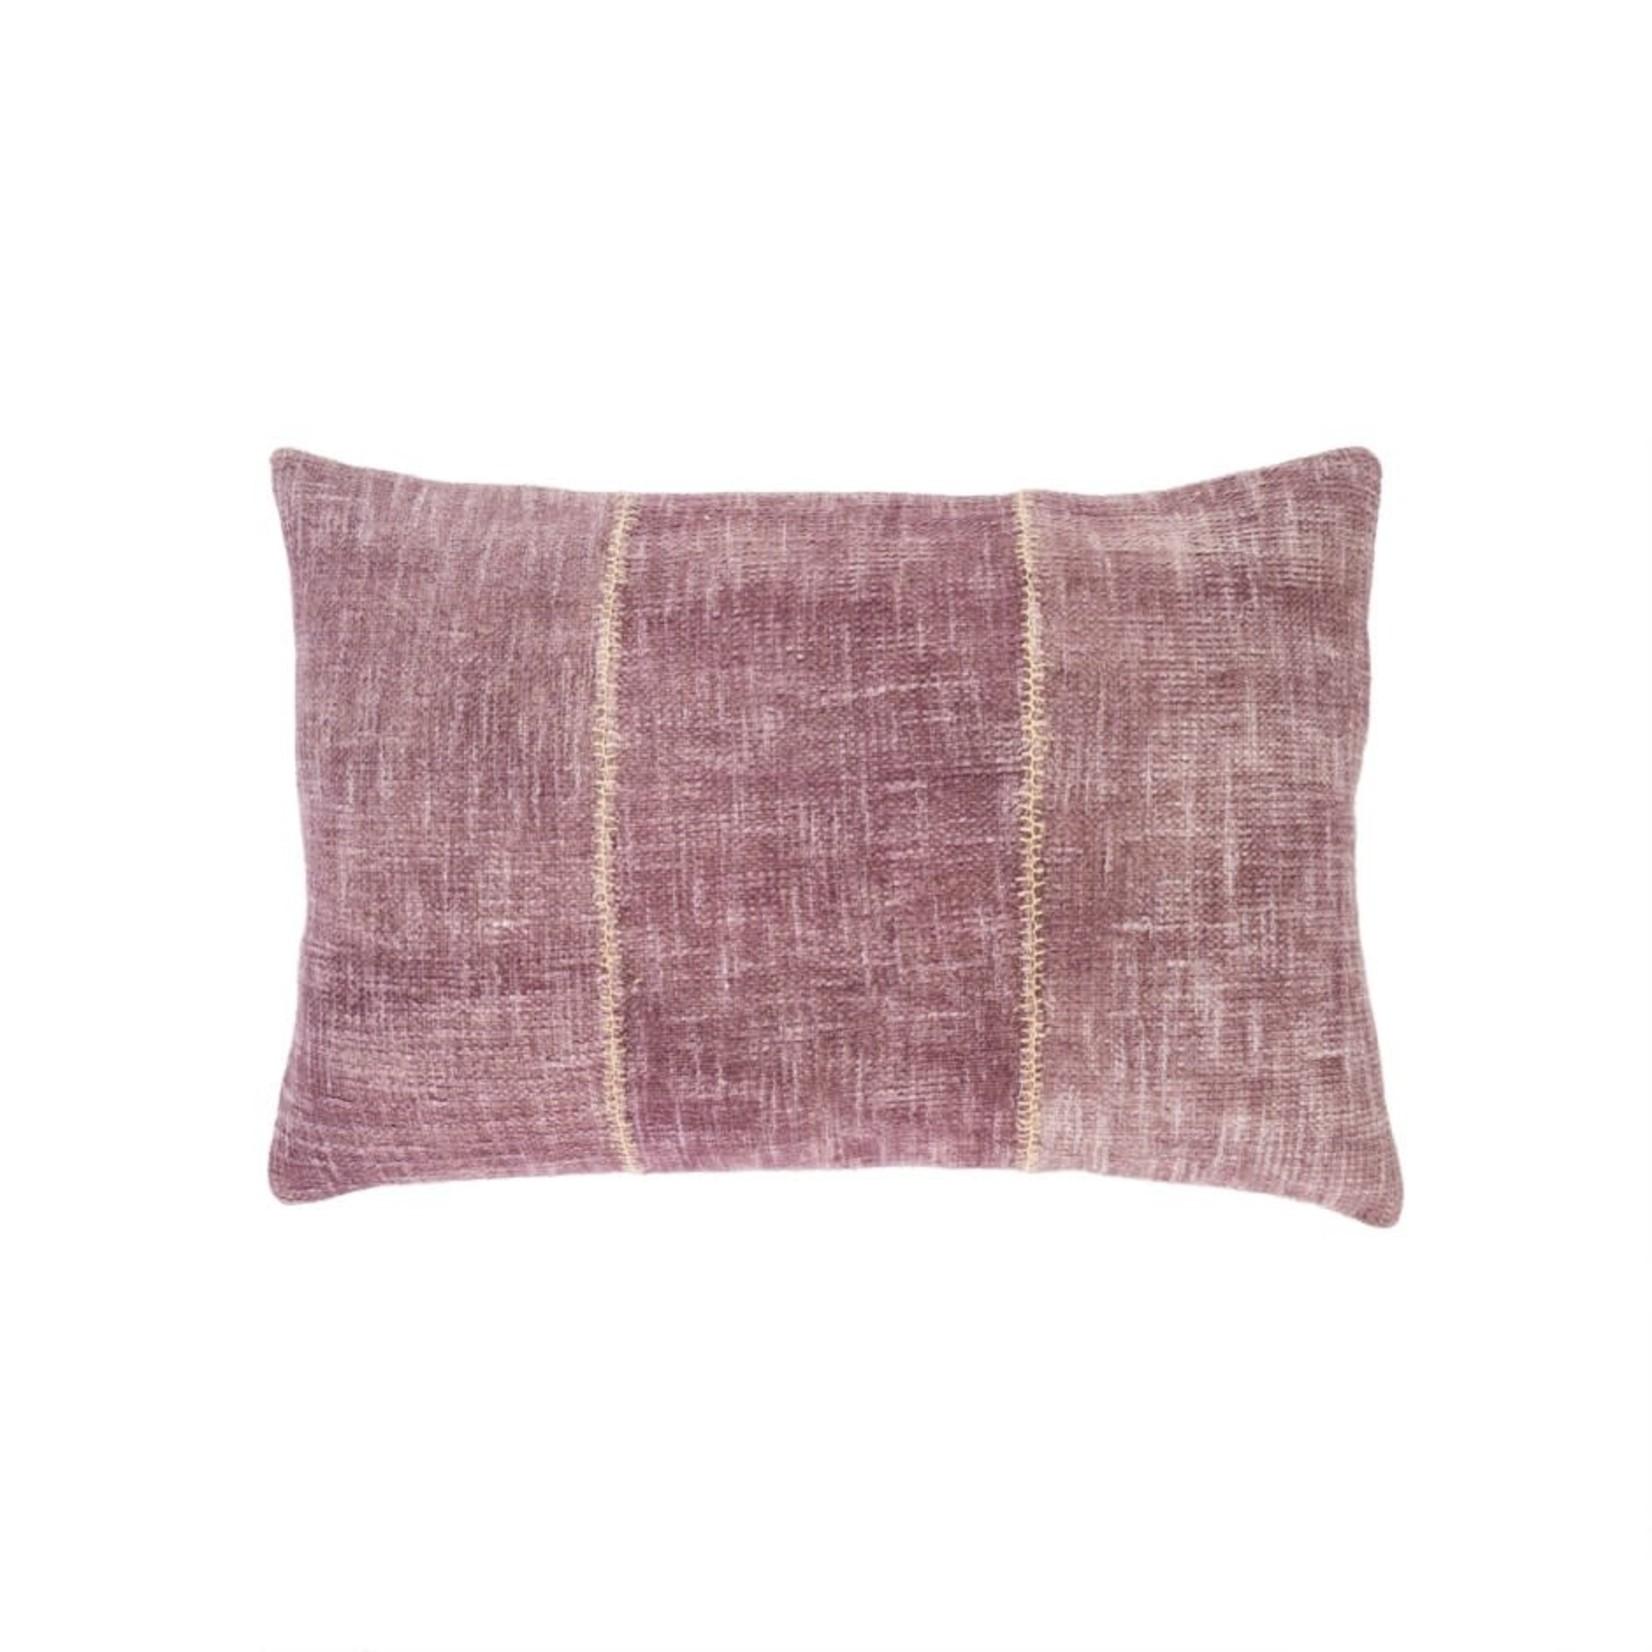 Stonewash Stitch Pillow, Plum